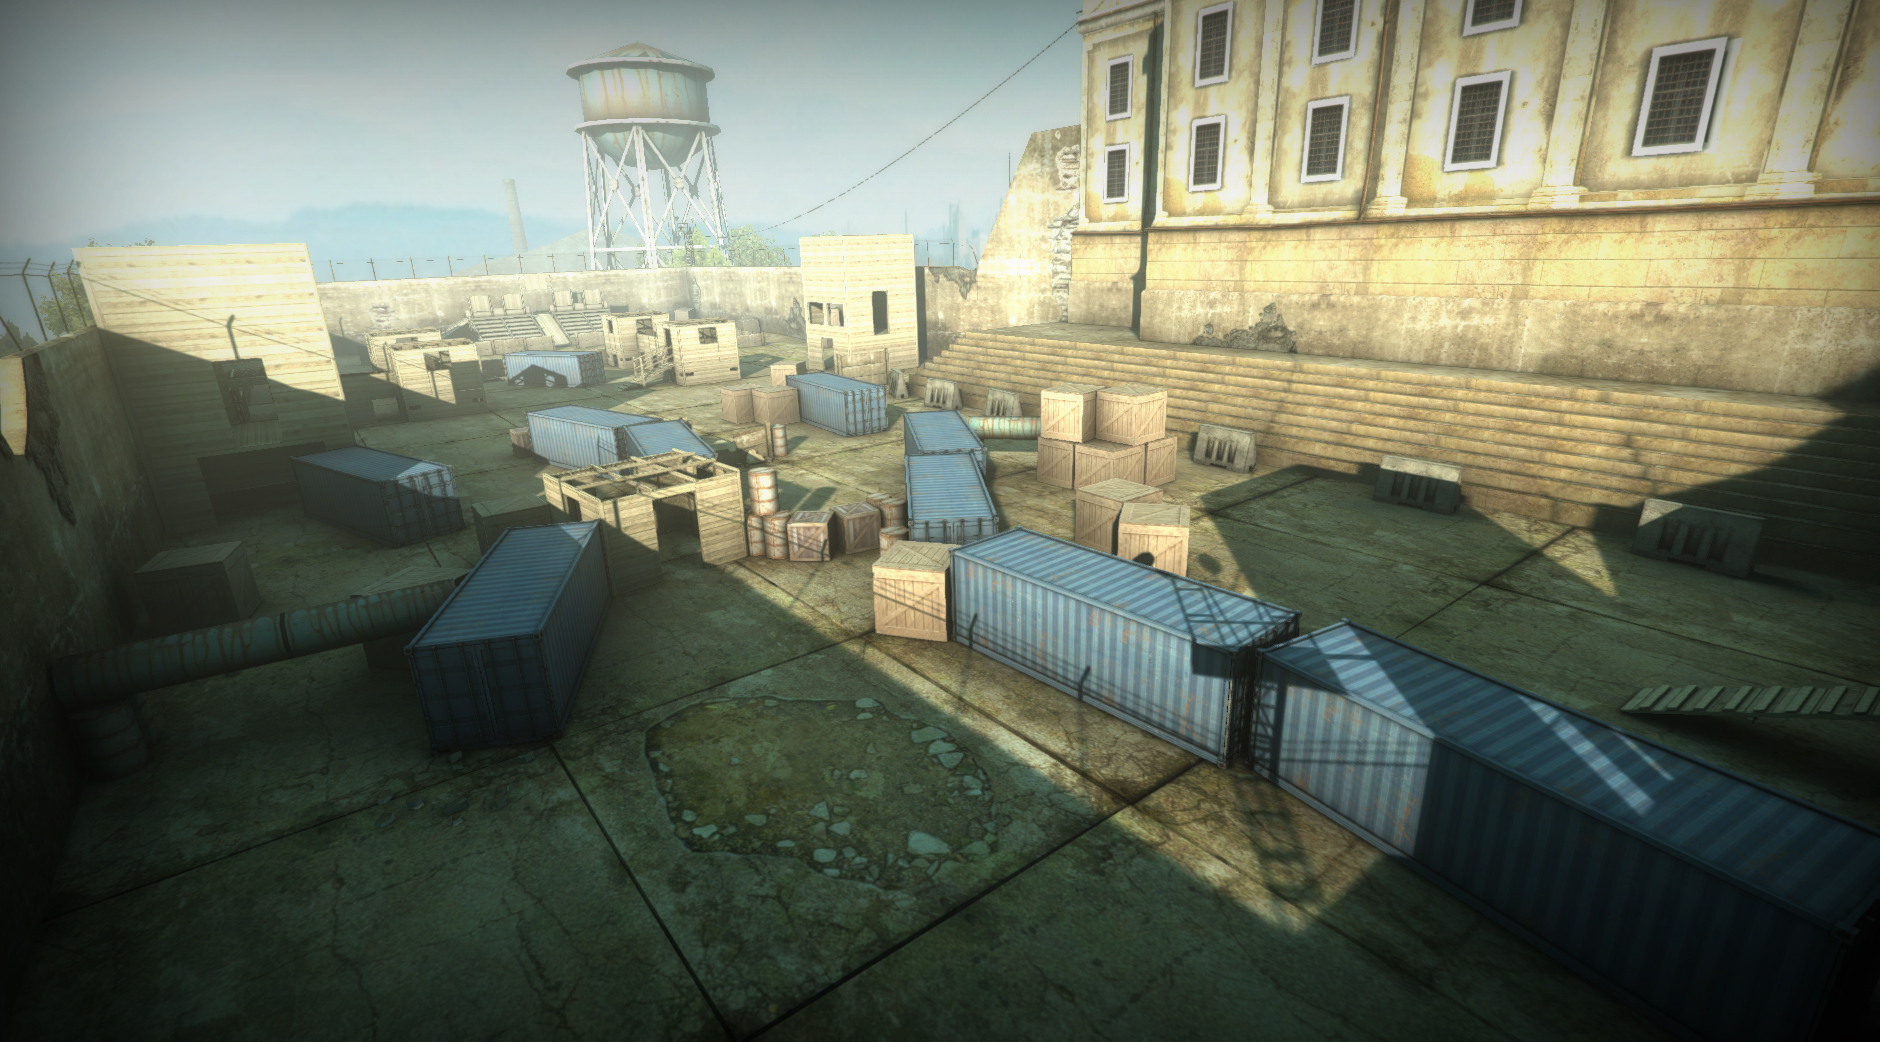 XFP2_Prison_Yard_01.jpg